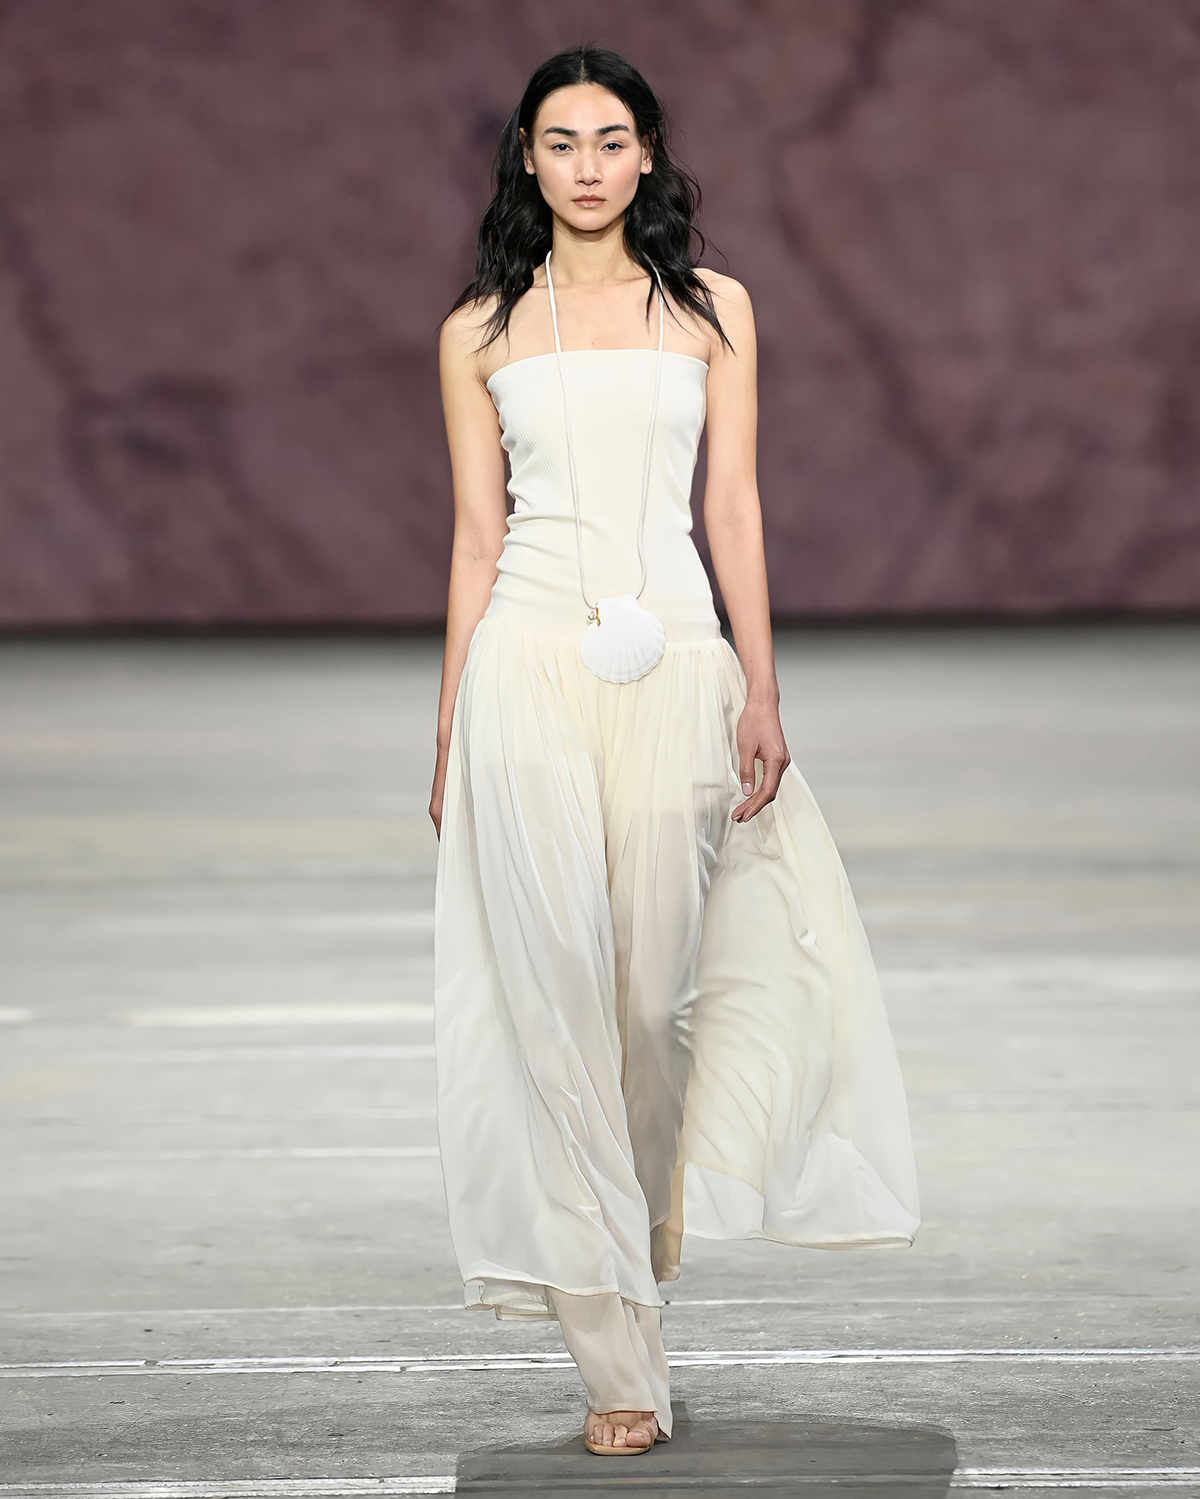 Thuỳ Trang Next Top diễn 3 show tại Australia Fashion Week